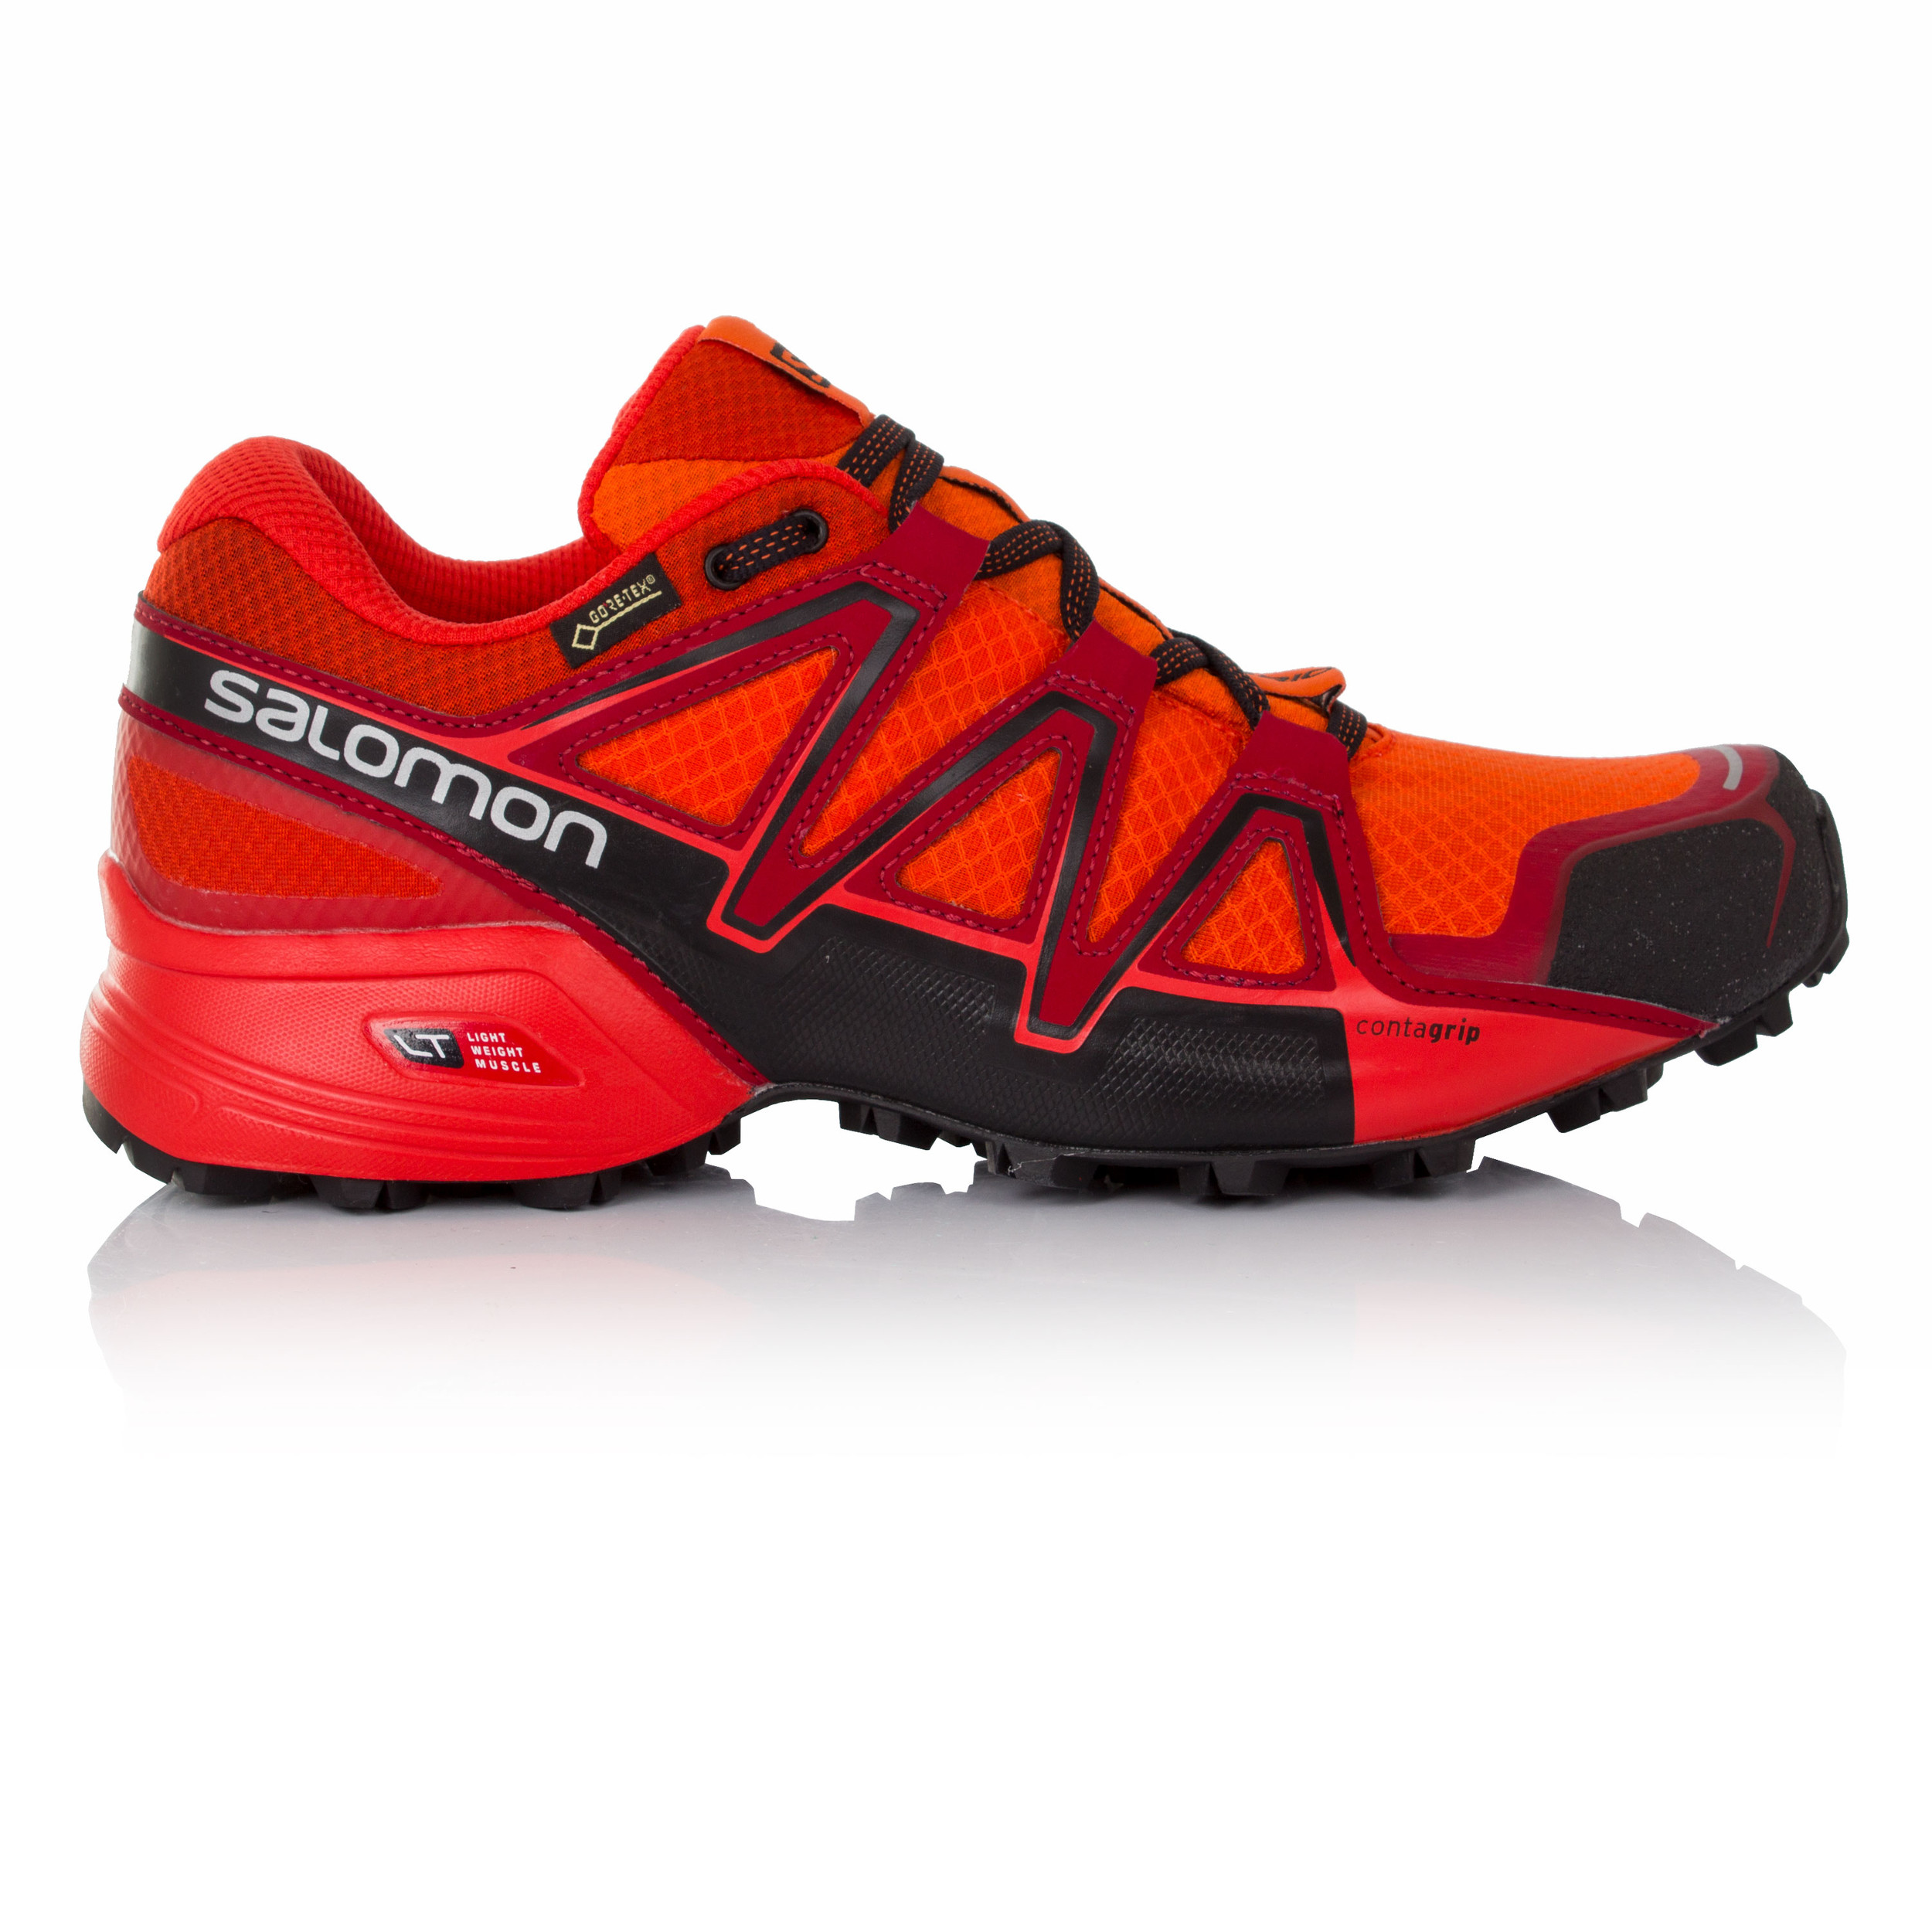 Details about Salomon Speedcross Vario 2 Mens Red Orange Gore Tex Running Shoes Trainers